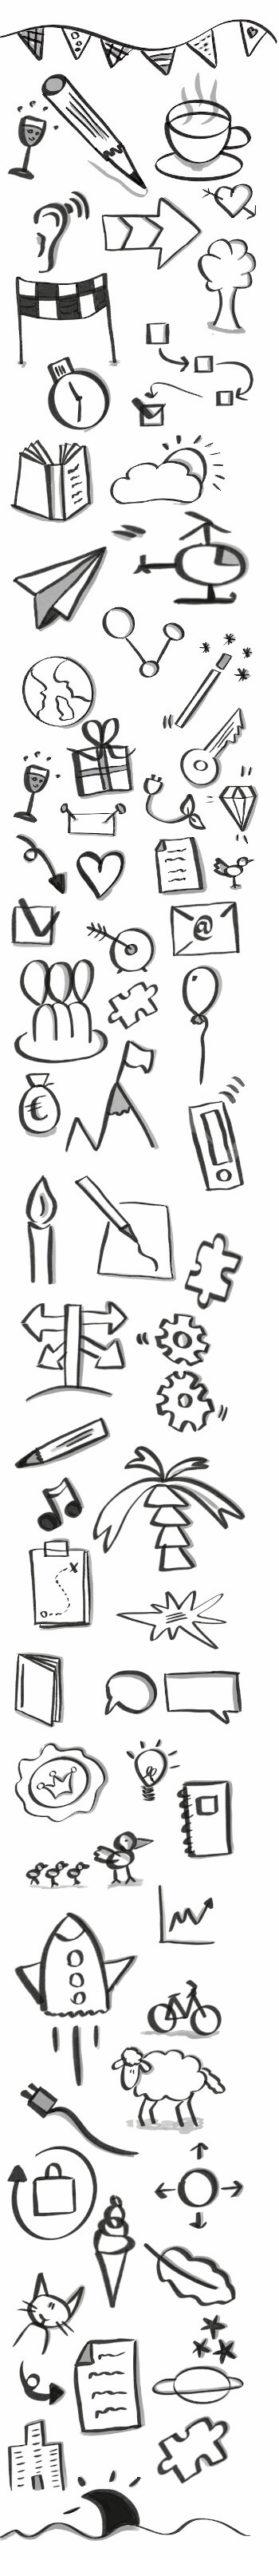 Brainstorm traject